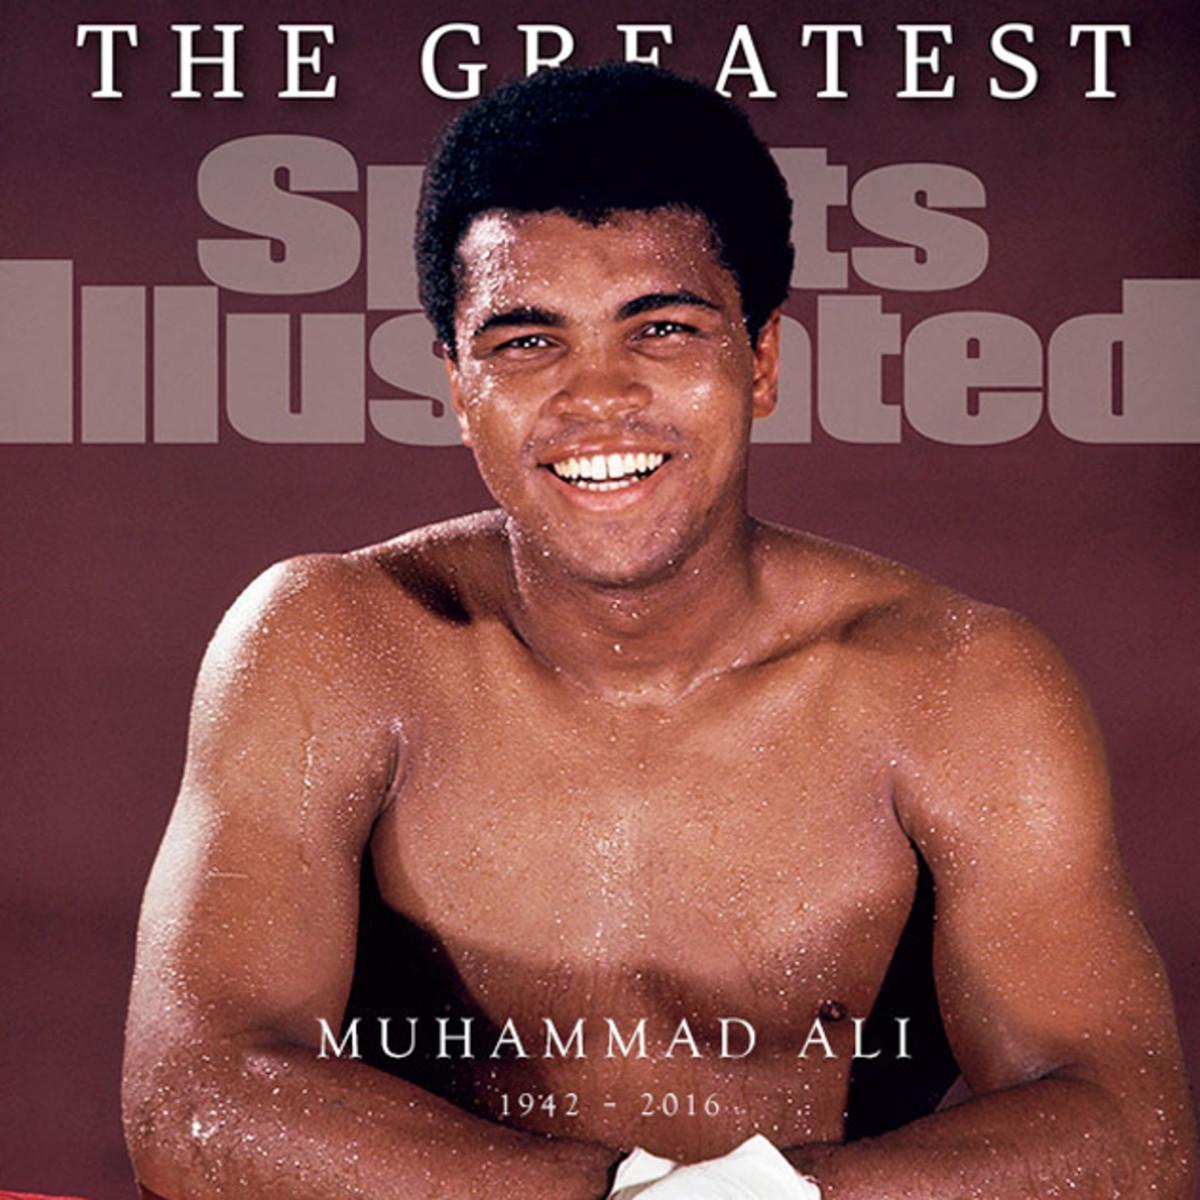 1-muhammad-ali-si-cover.jpg